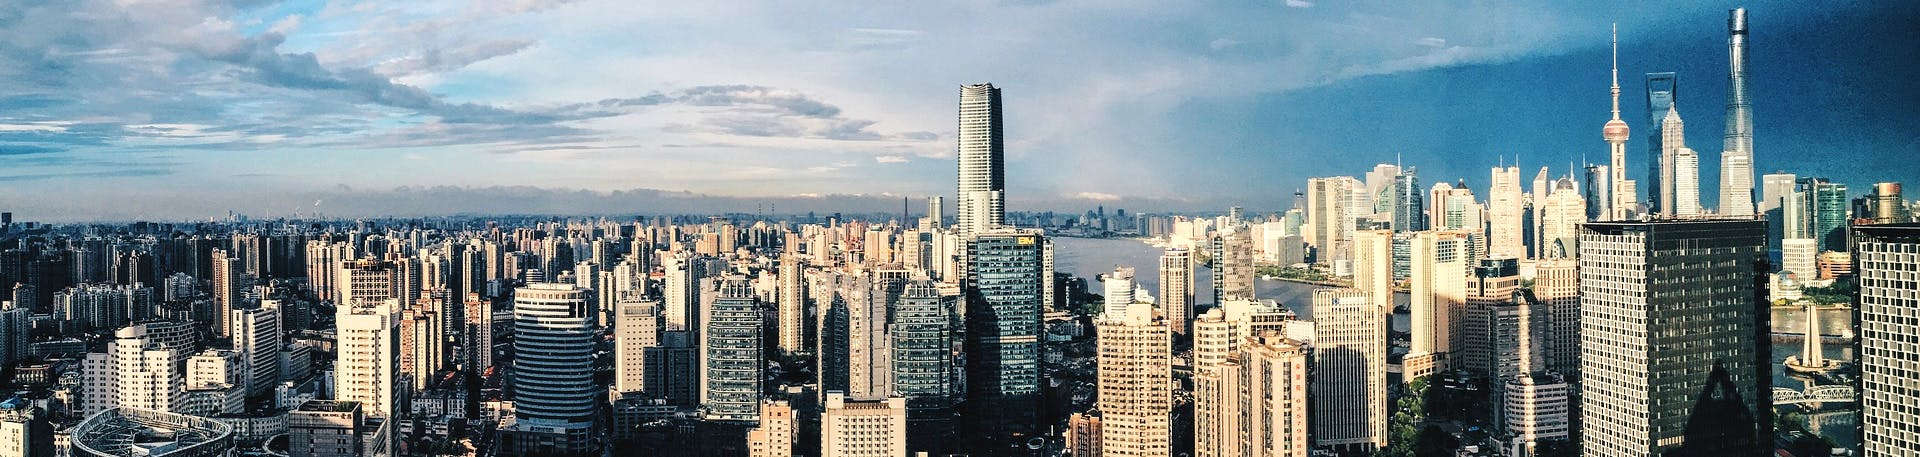 Repräsentanz_China_Interview_Shanghai